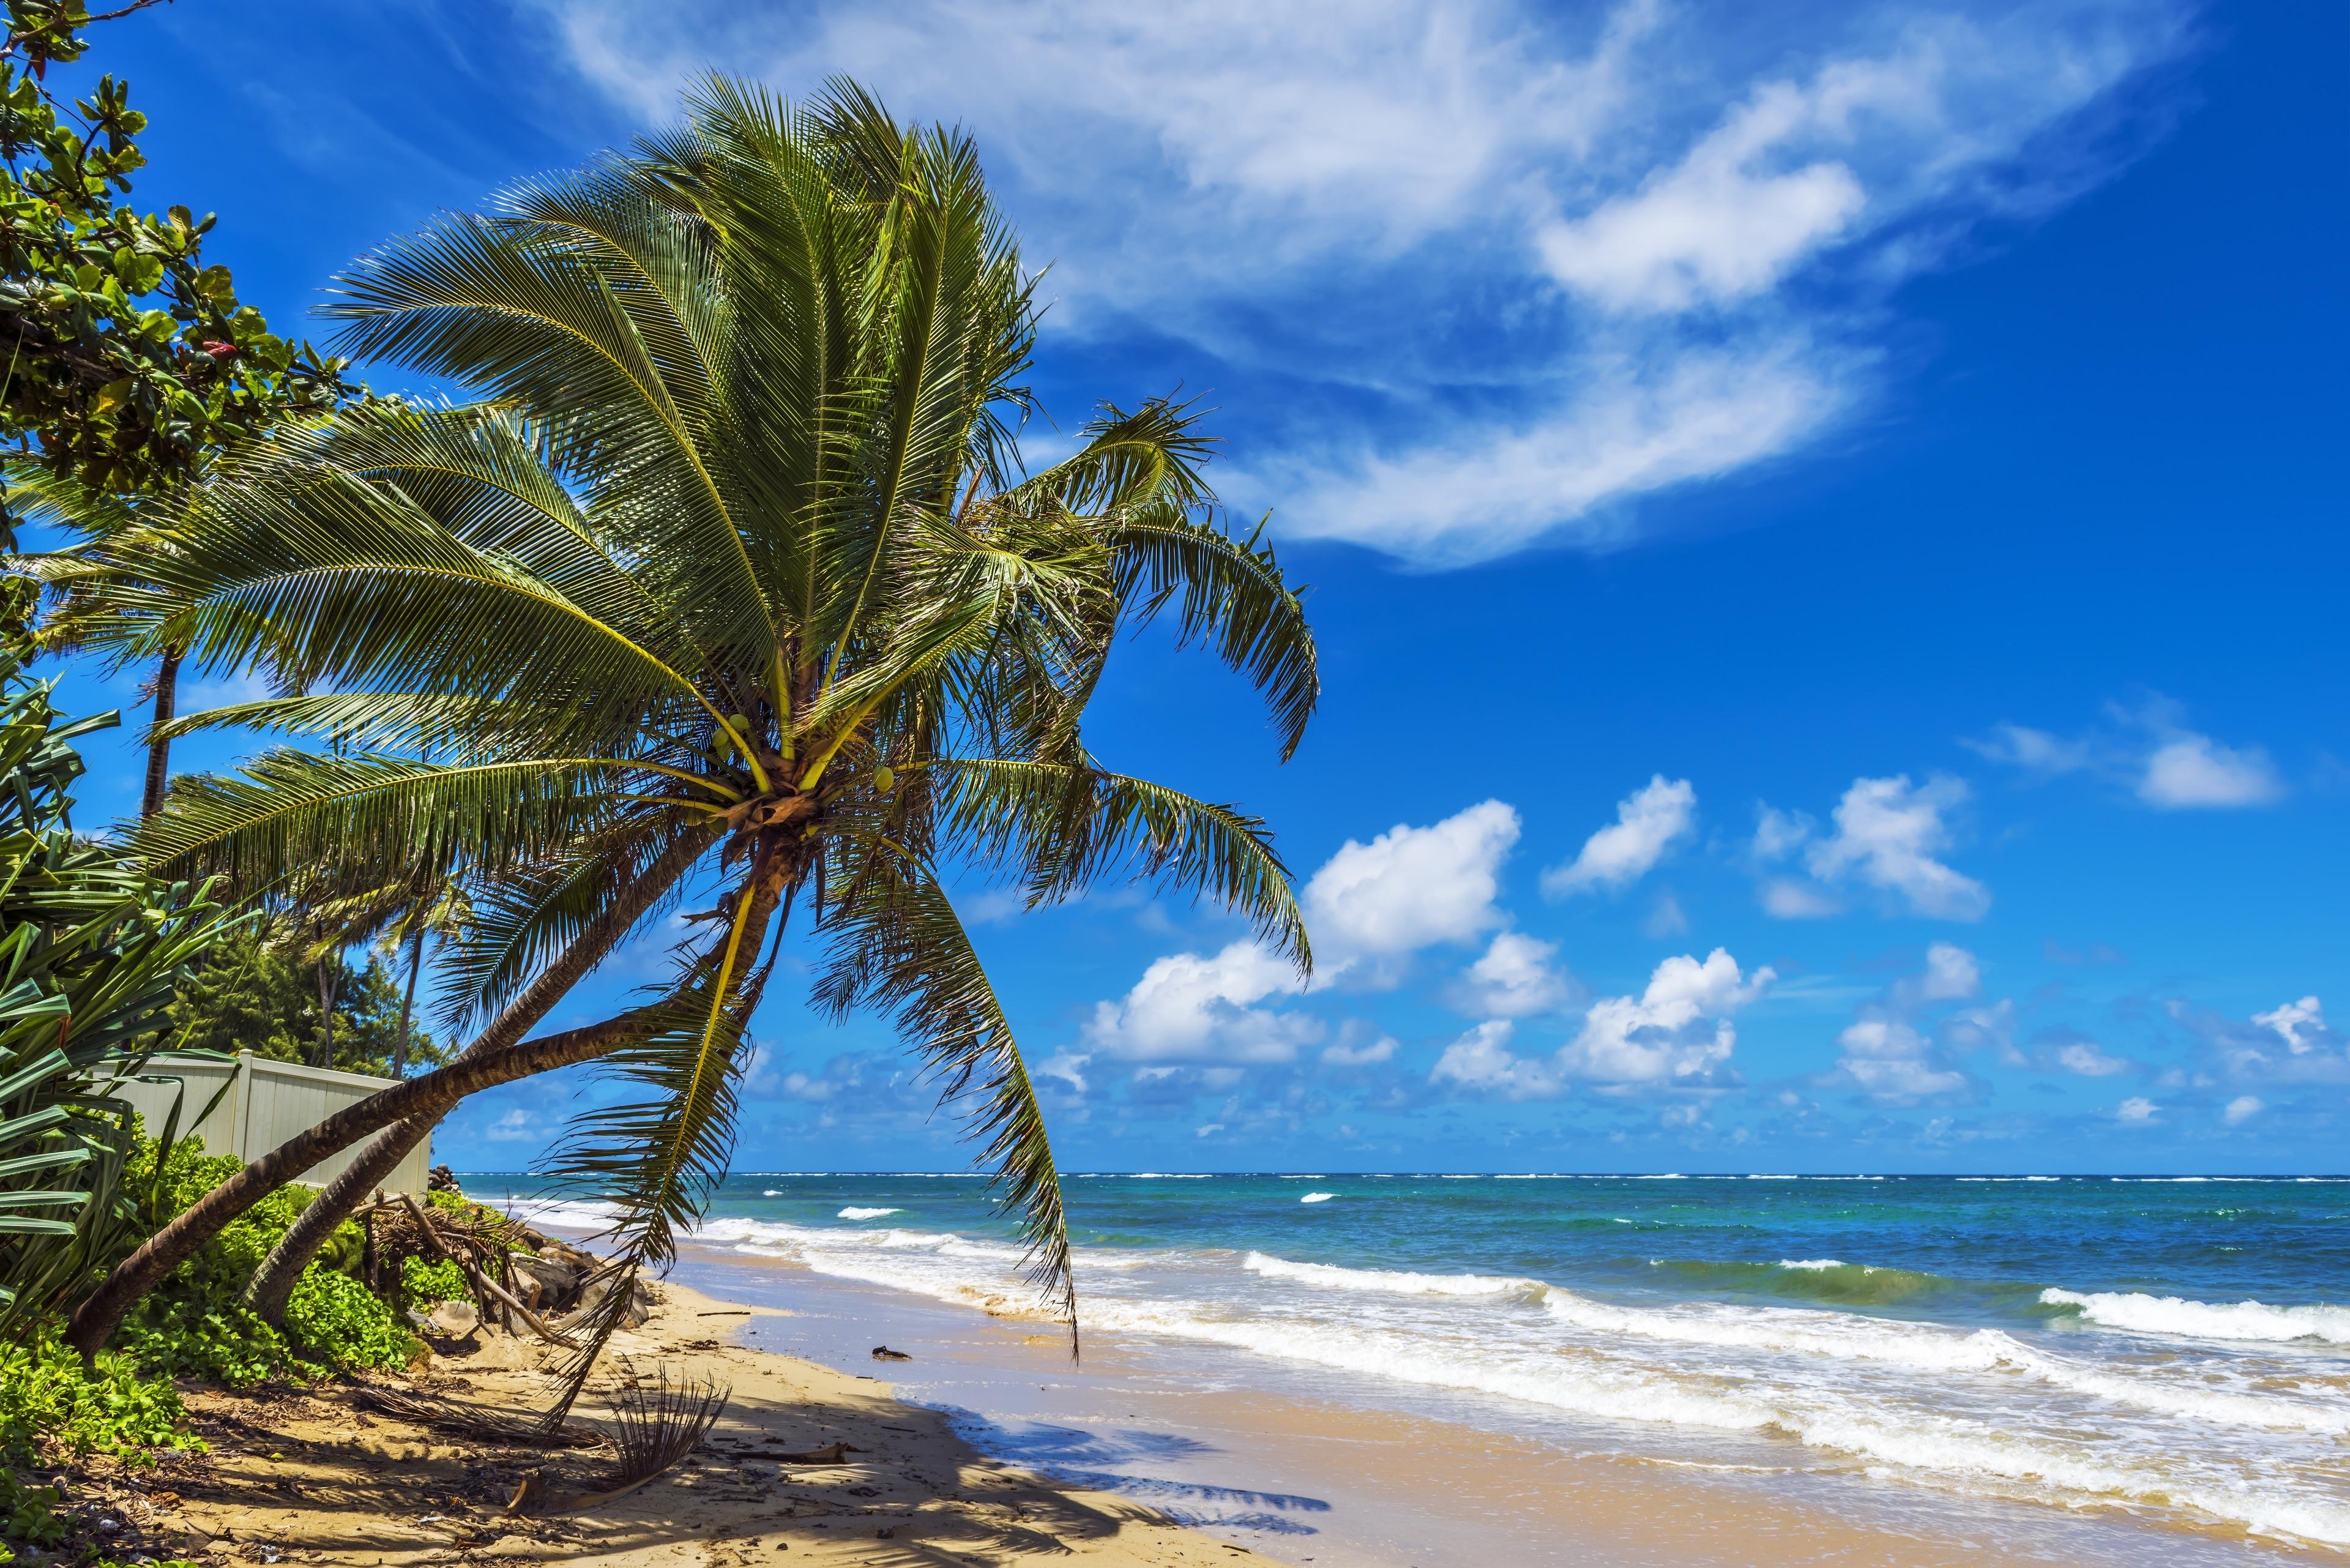 Punalu'u Beach, Pahala, Hawaii, United States of America